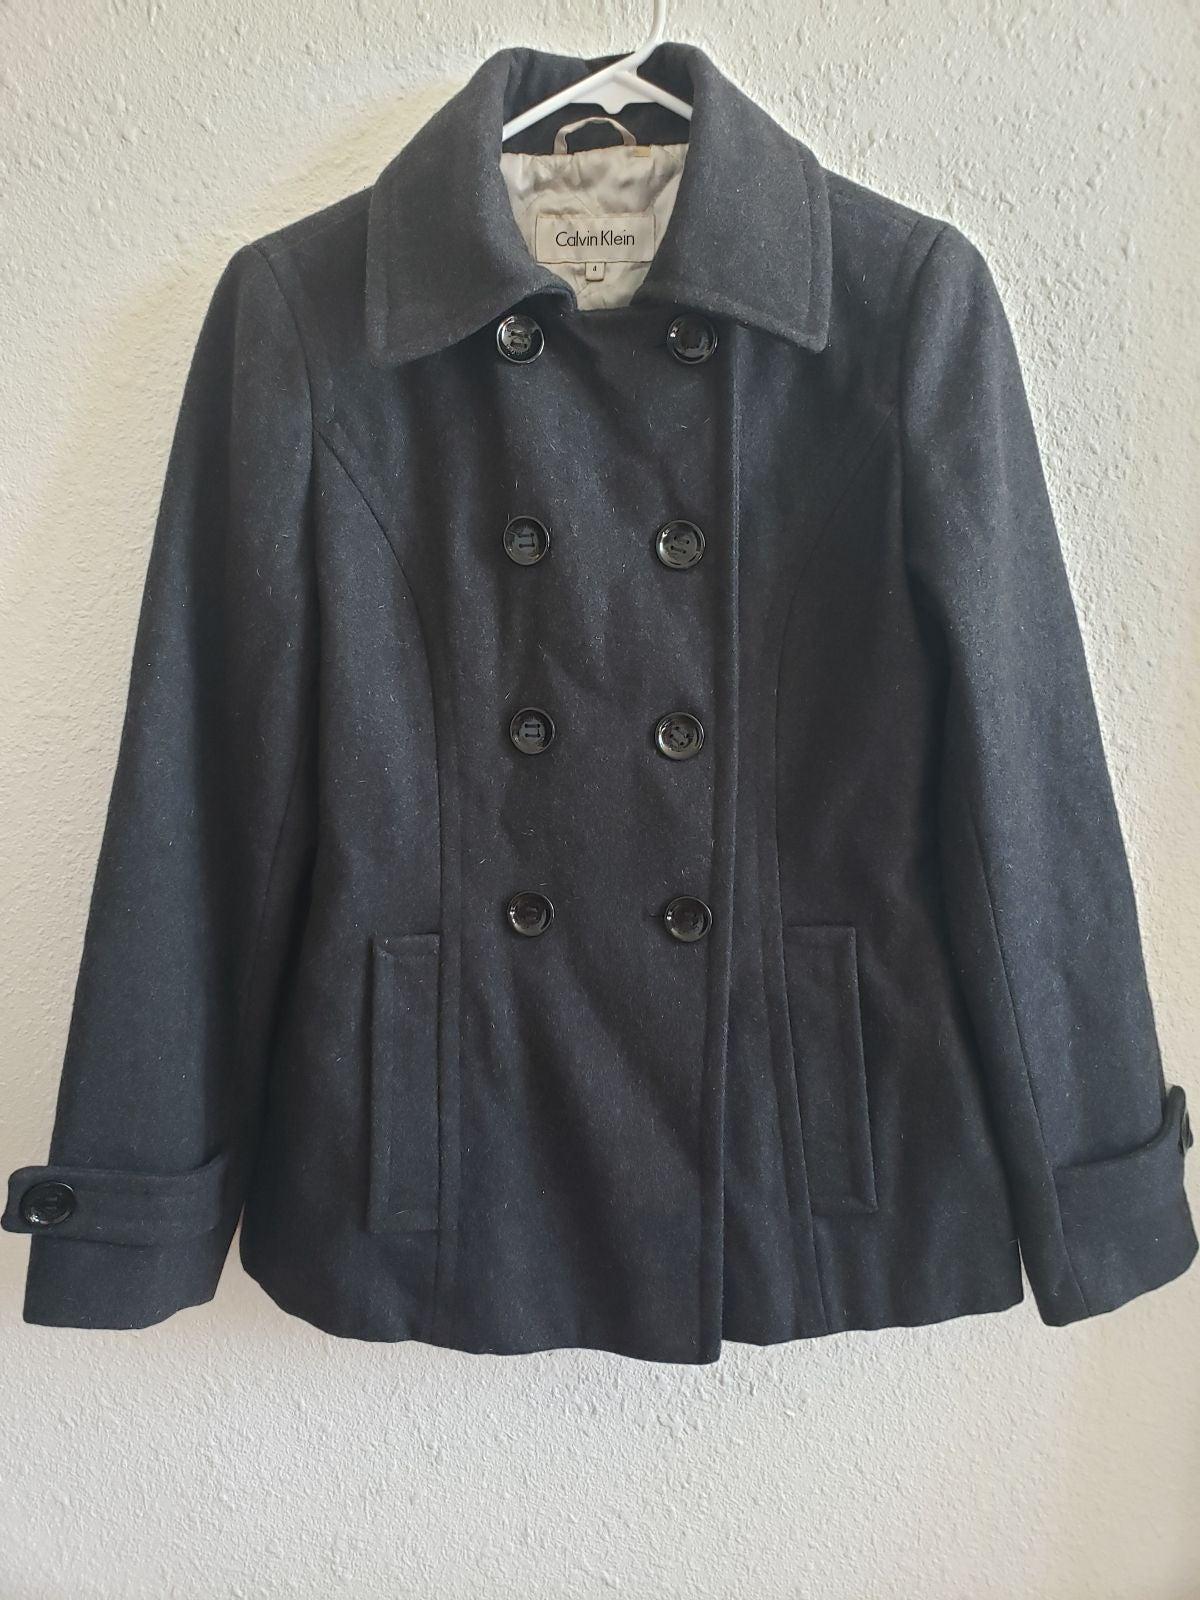 Calvin Klein Wool/polyester Coat